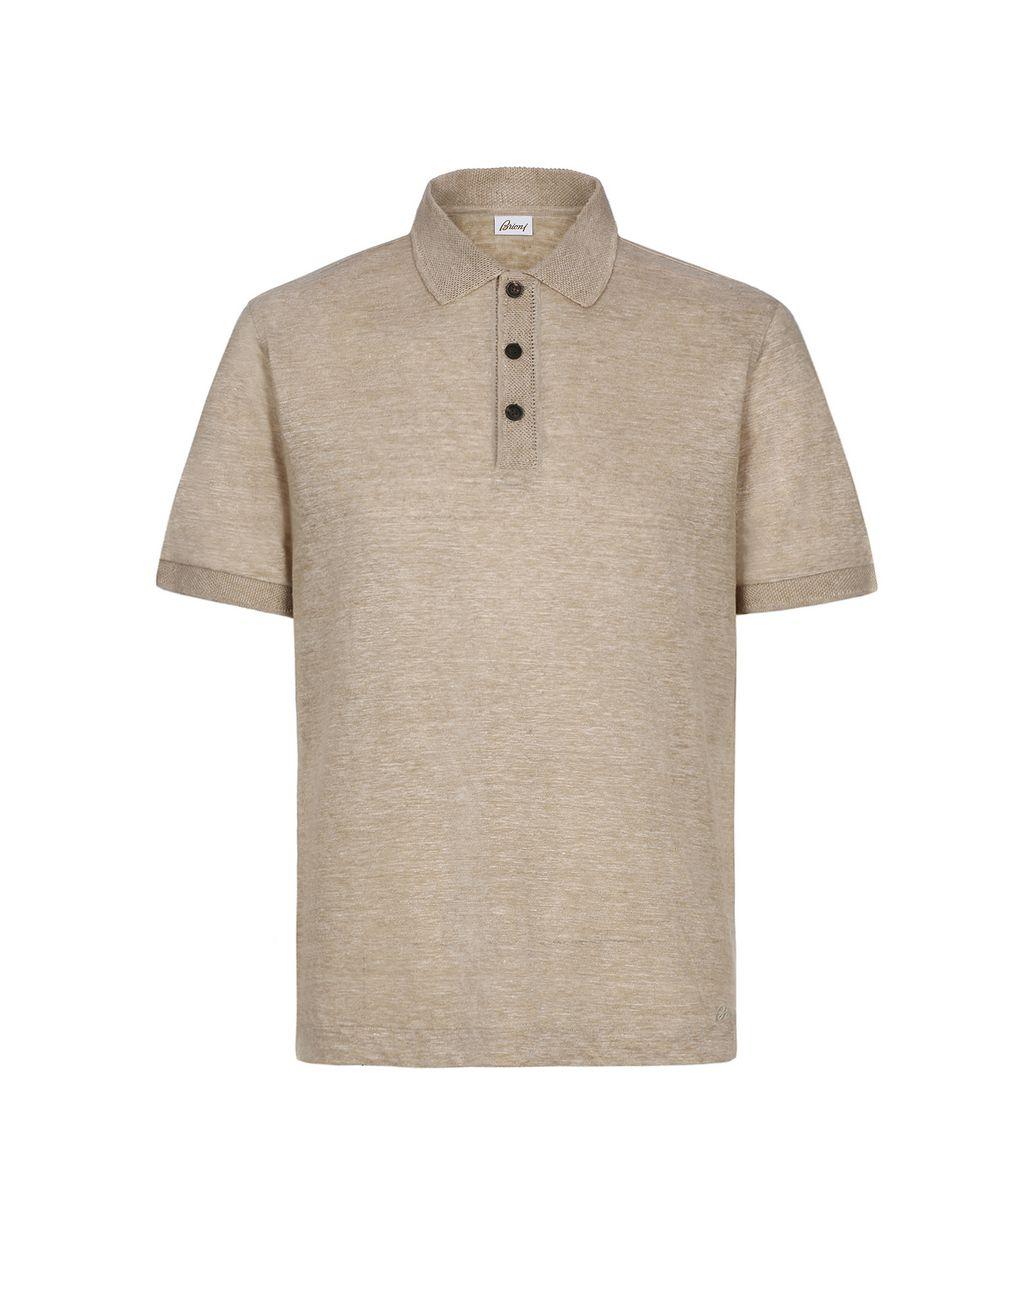 BRIONI Beige Linen Polo Shirt T-Shirts & Polos Man f